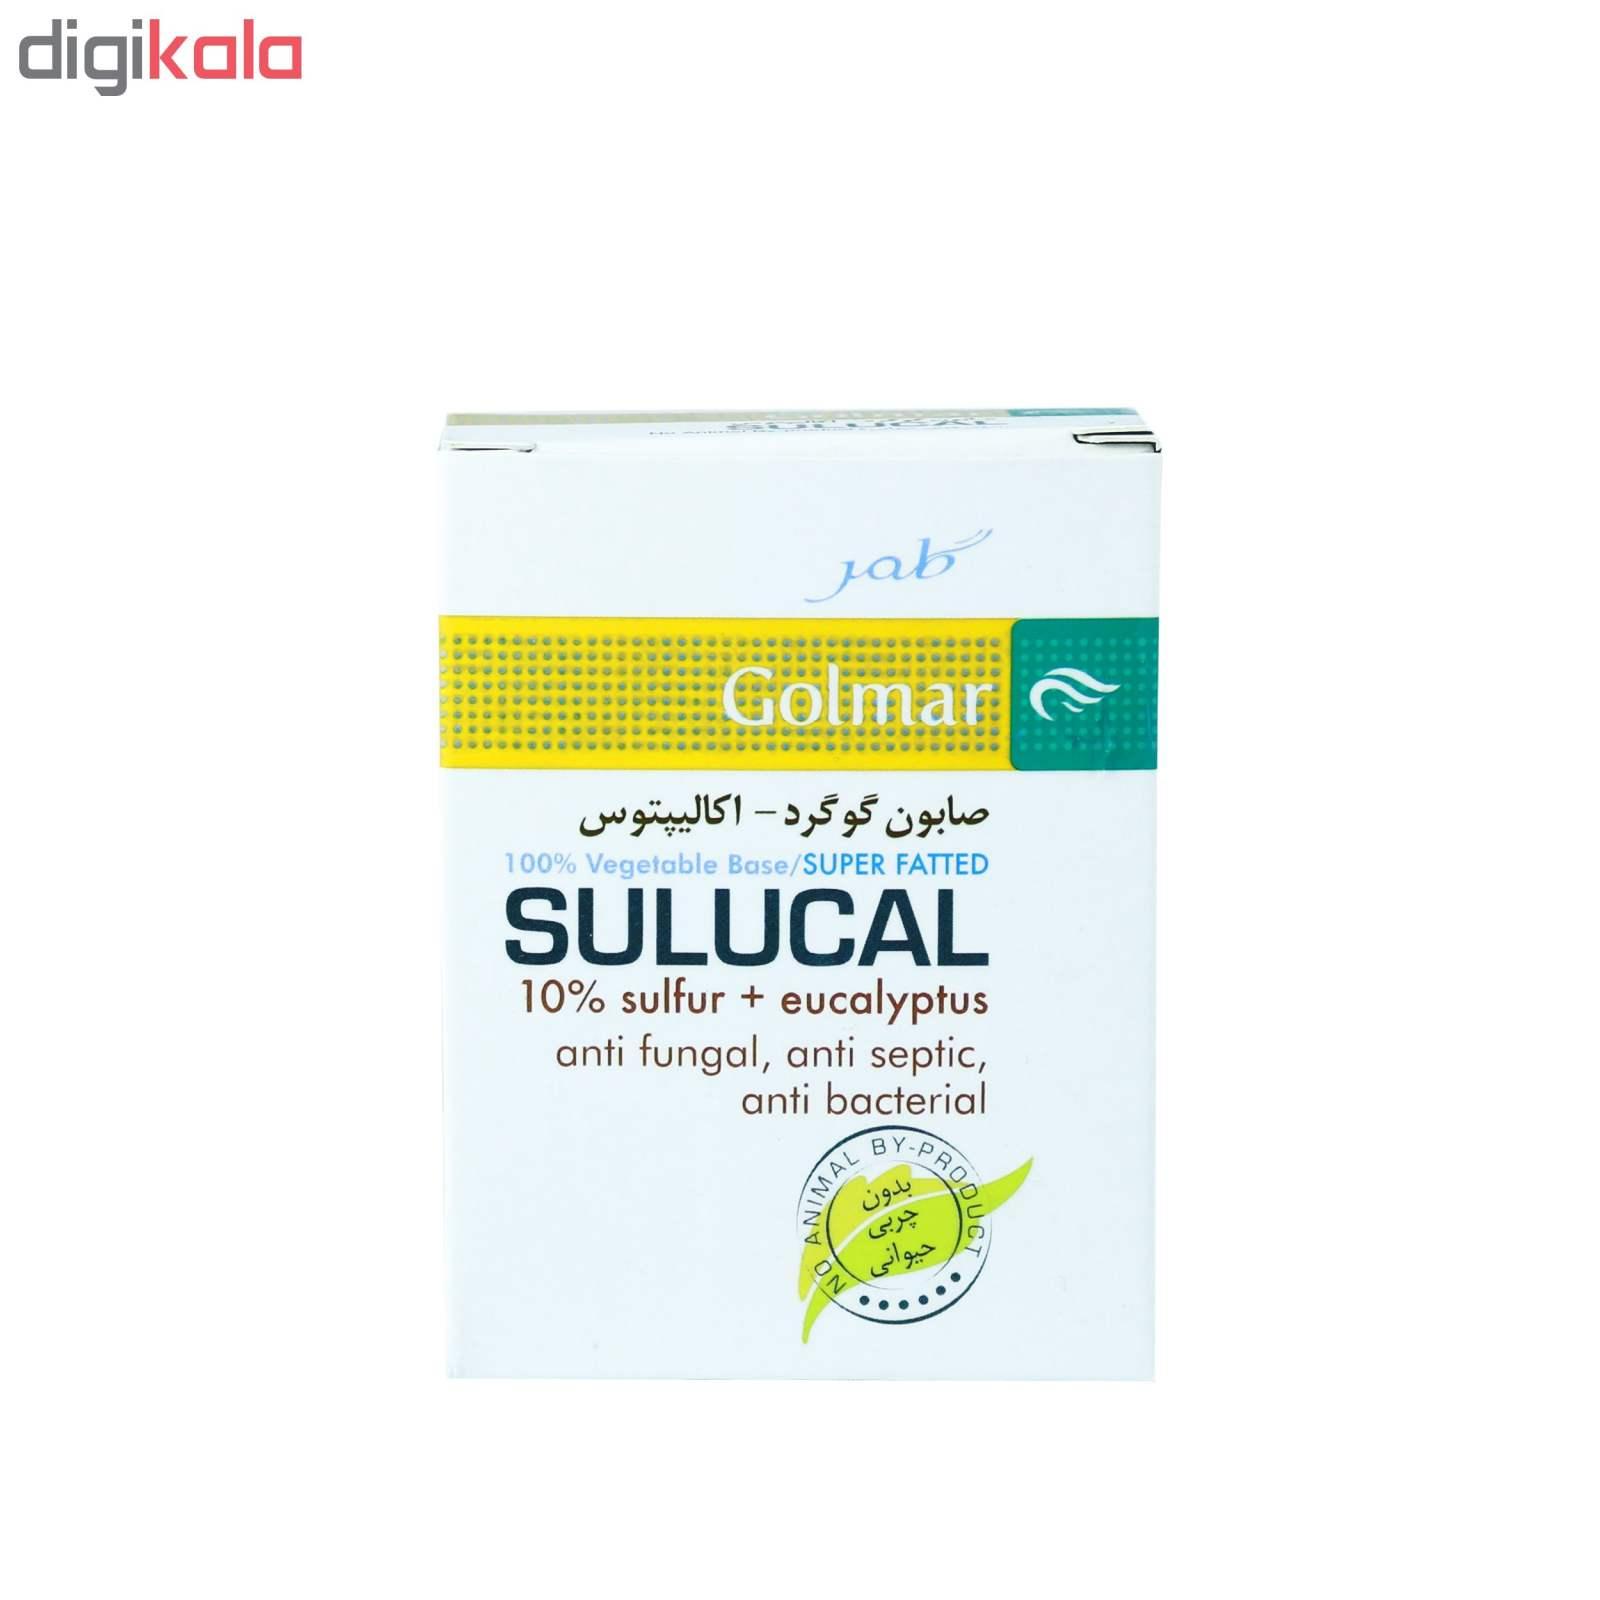 صابون ضد باکتری گلمر مدل sulucal وزن 100 گرم main 1 1